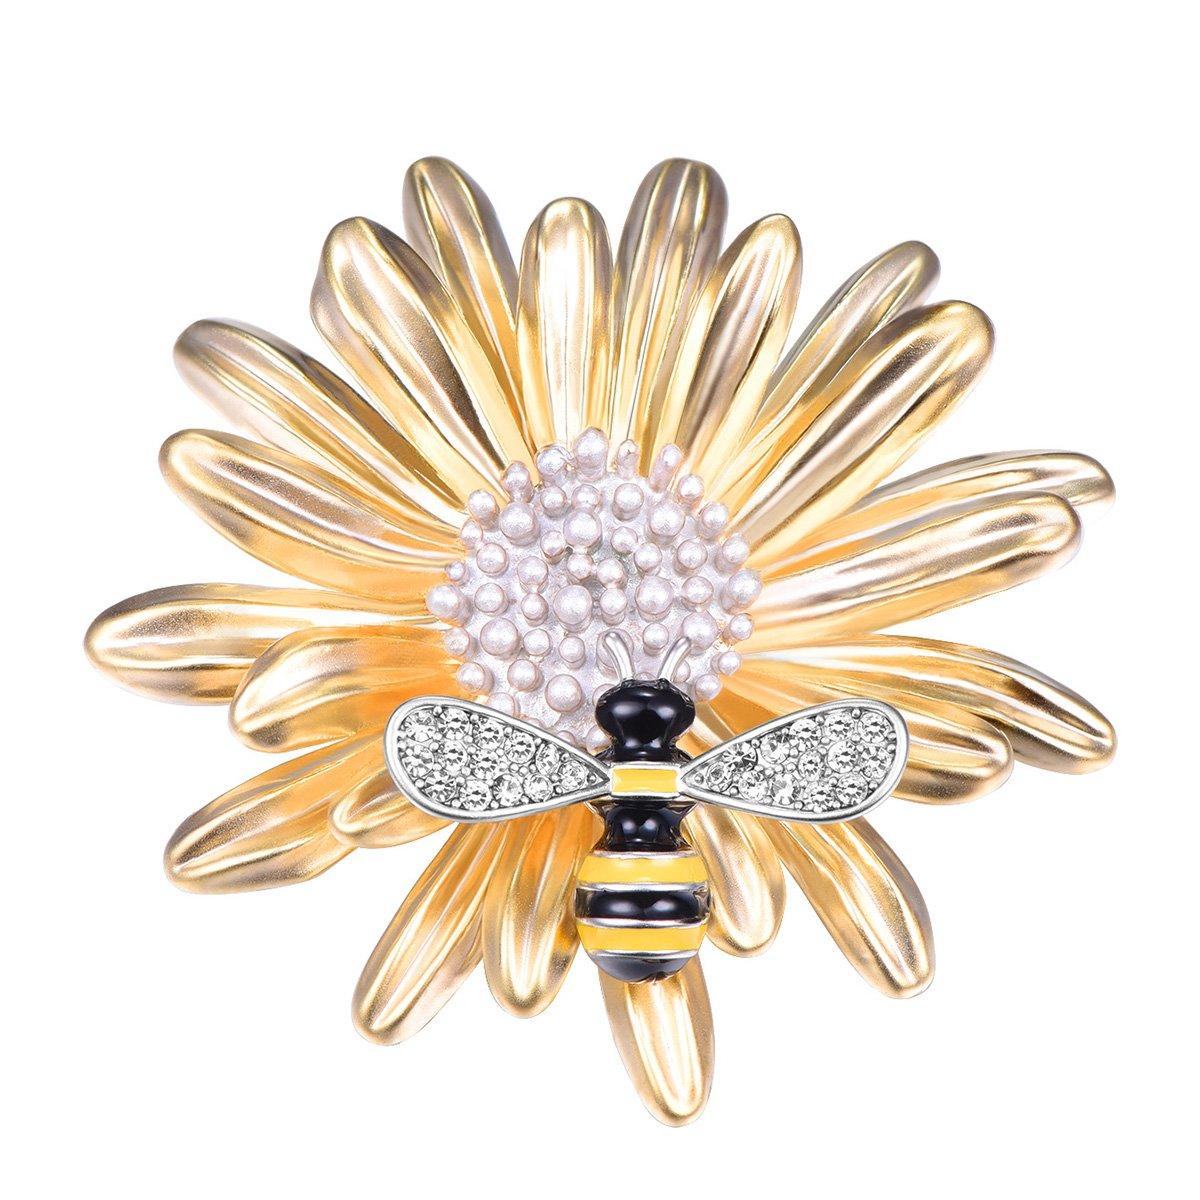 FOCALOOK Women's Daisy Flower Charm Enamel Bee Crystal Art Deco Gold Plated Large Rhinestone Brooch Pins